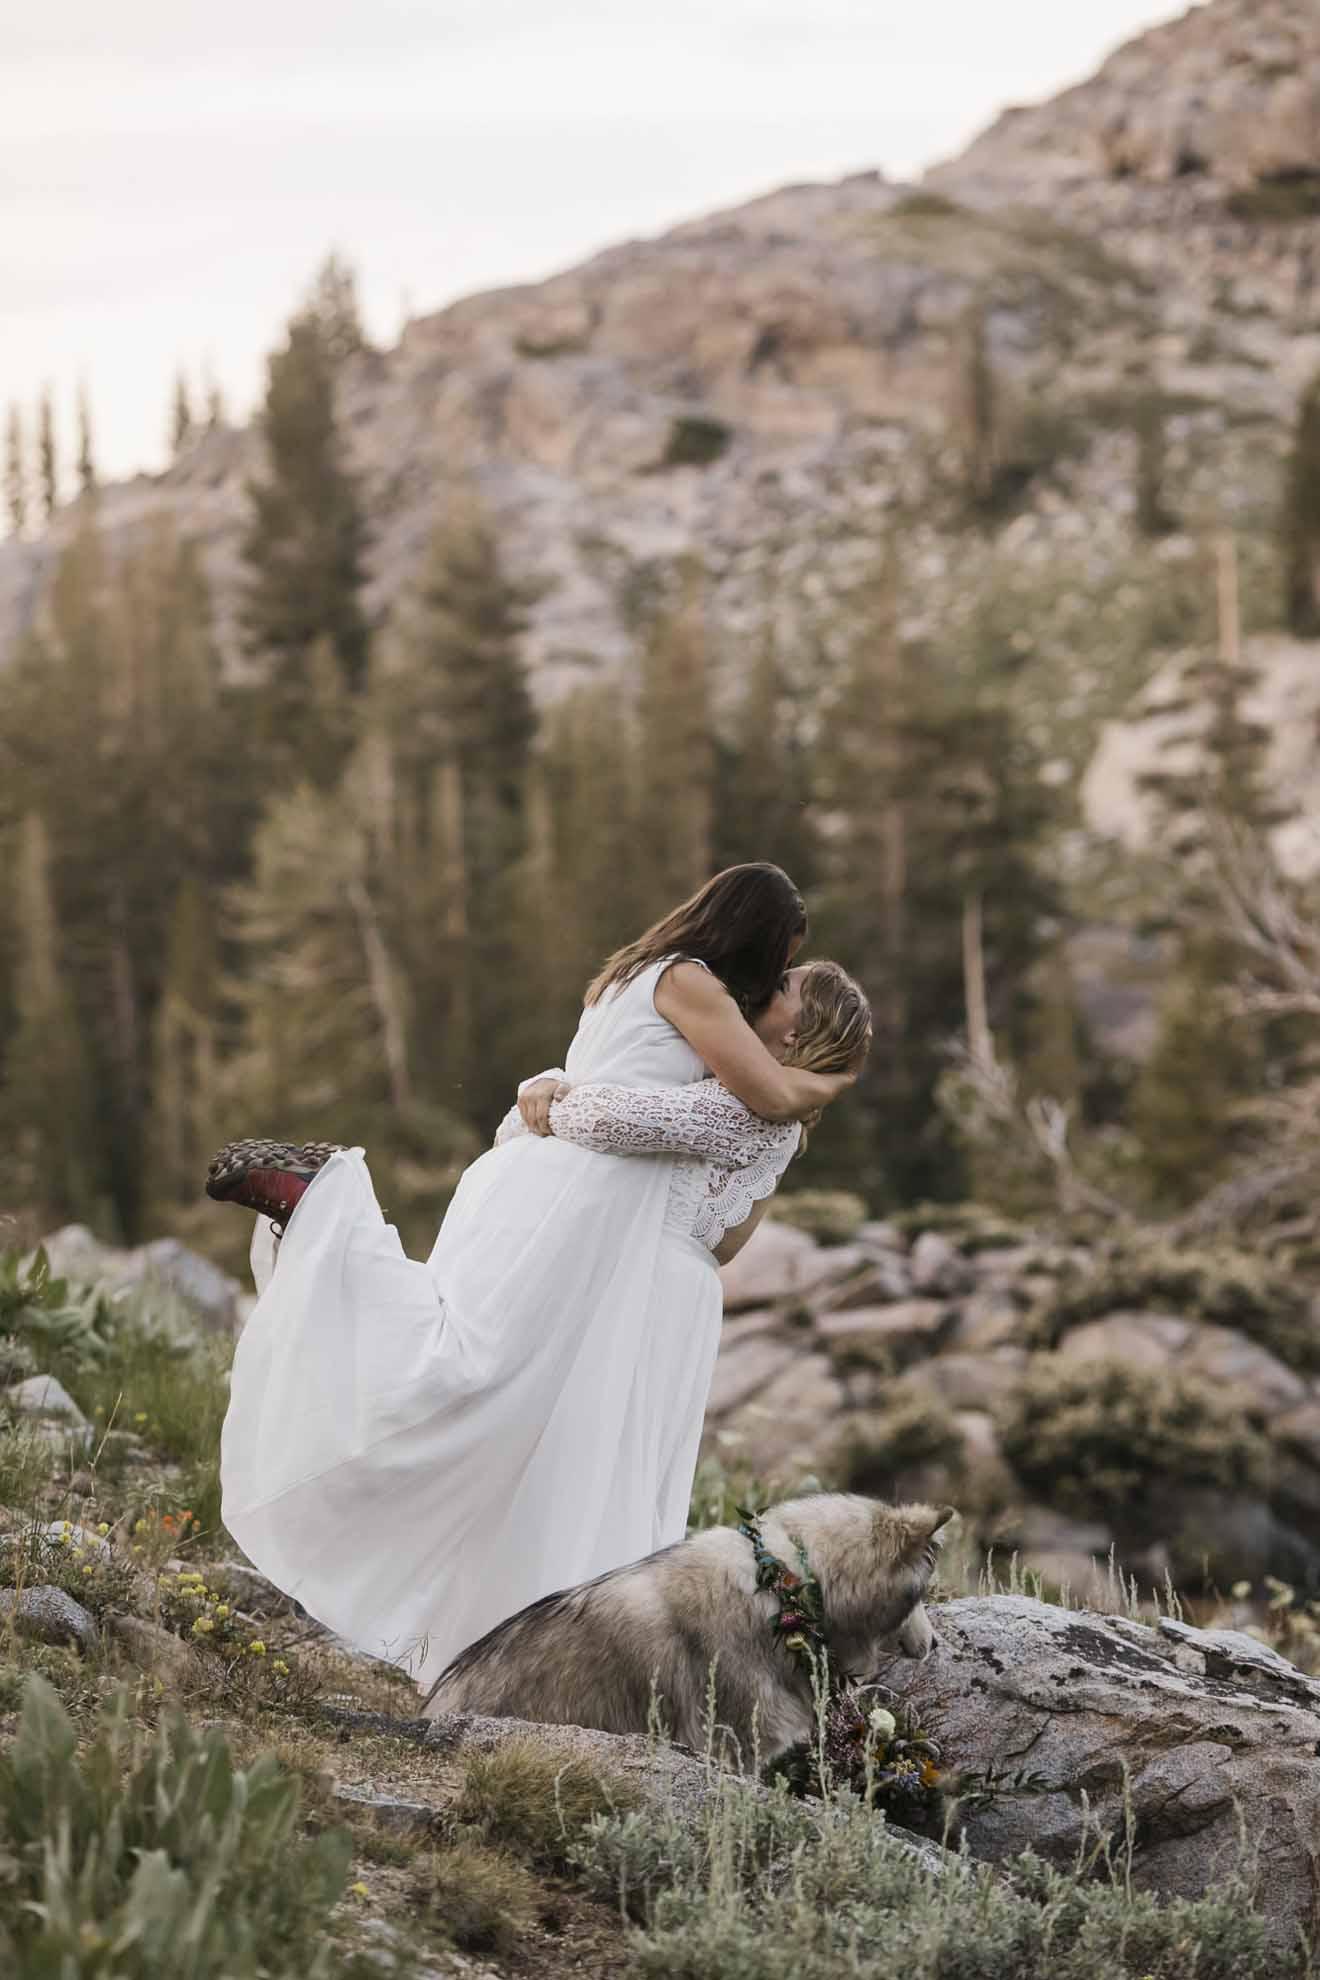 Hiking_Elopement_Sierra_Nevada_Mountains_California USA Natalie N Photography lesbian lgbtqia+ gay wedding marriage Dancing With Her magazine